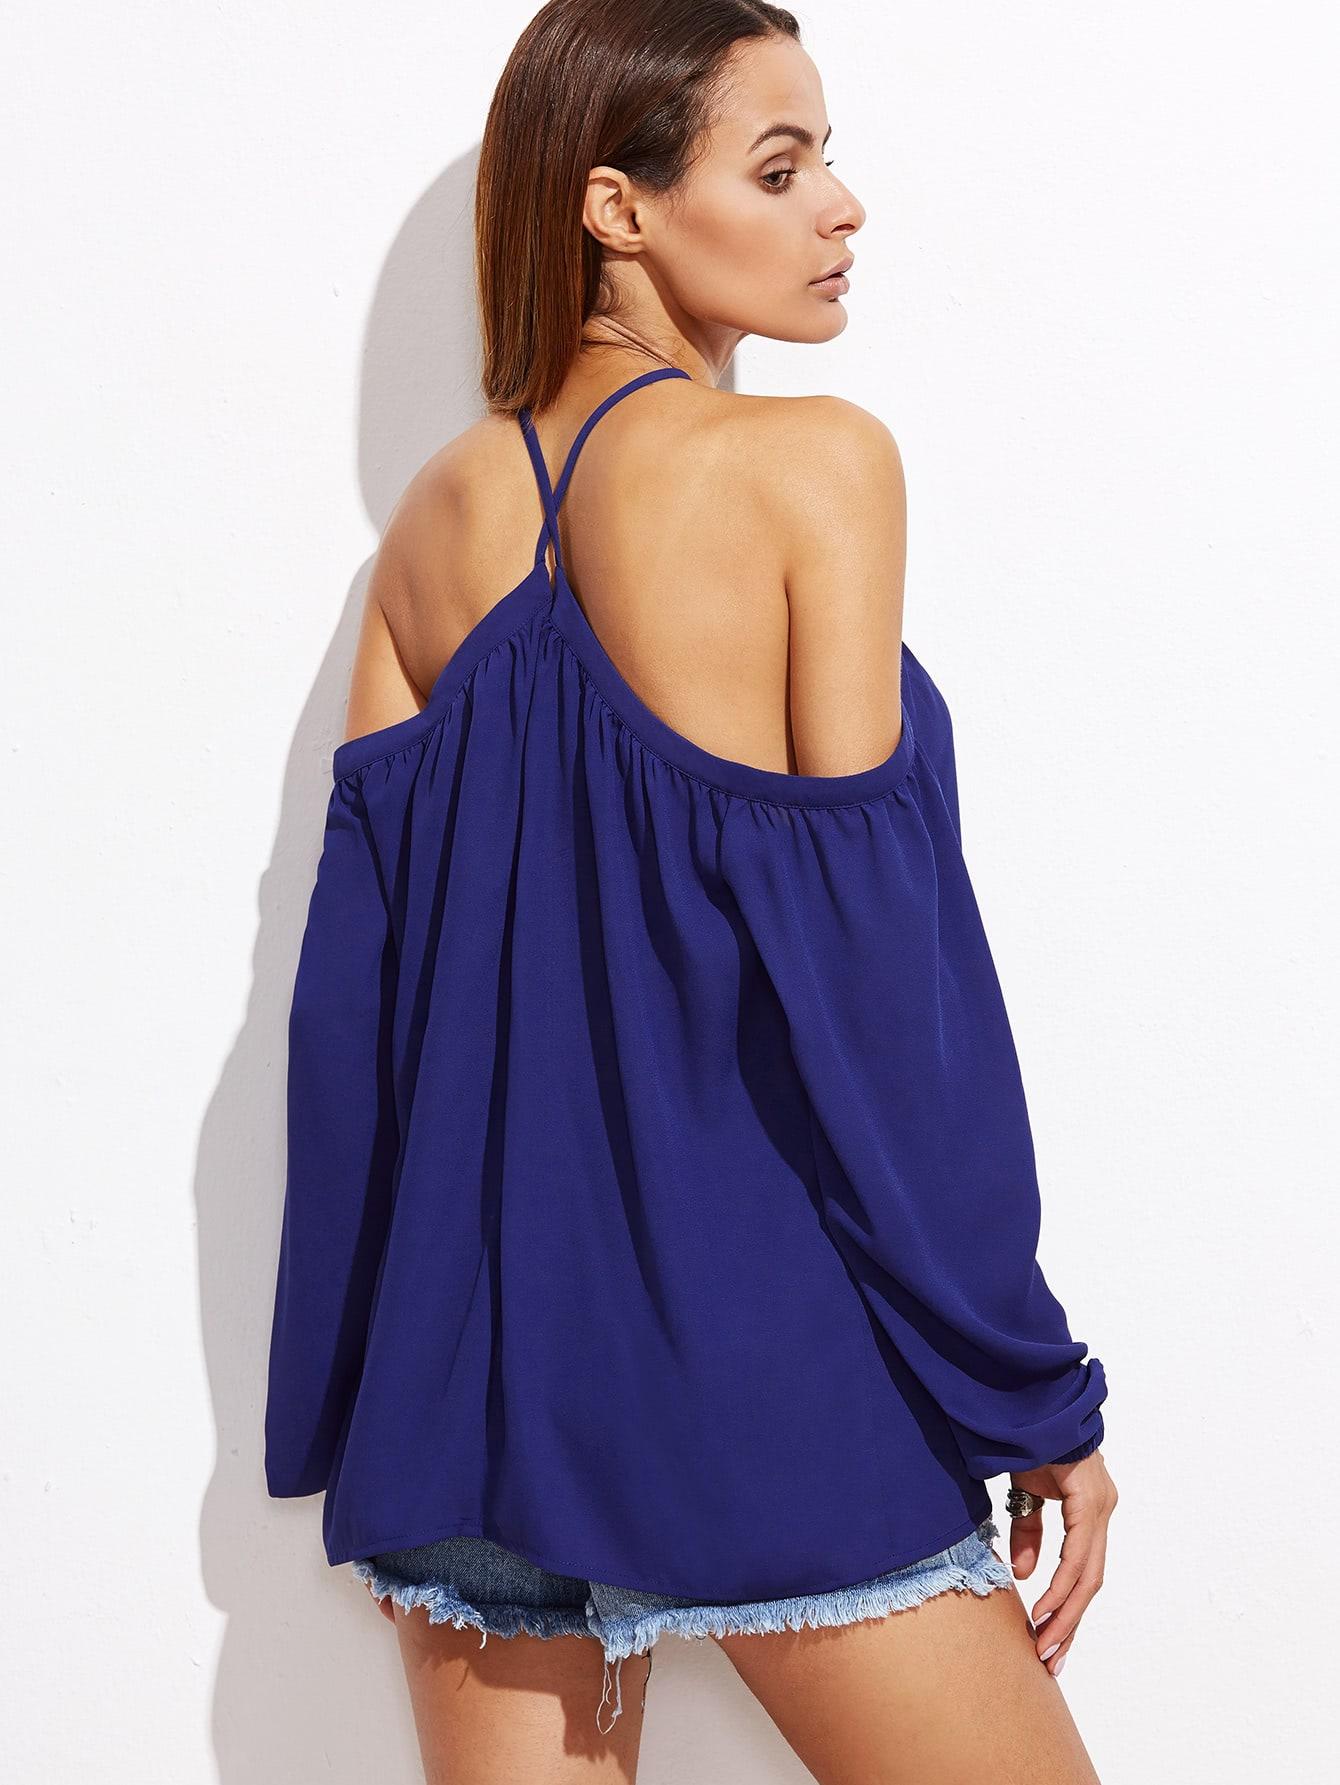 blouse161018702_2